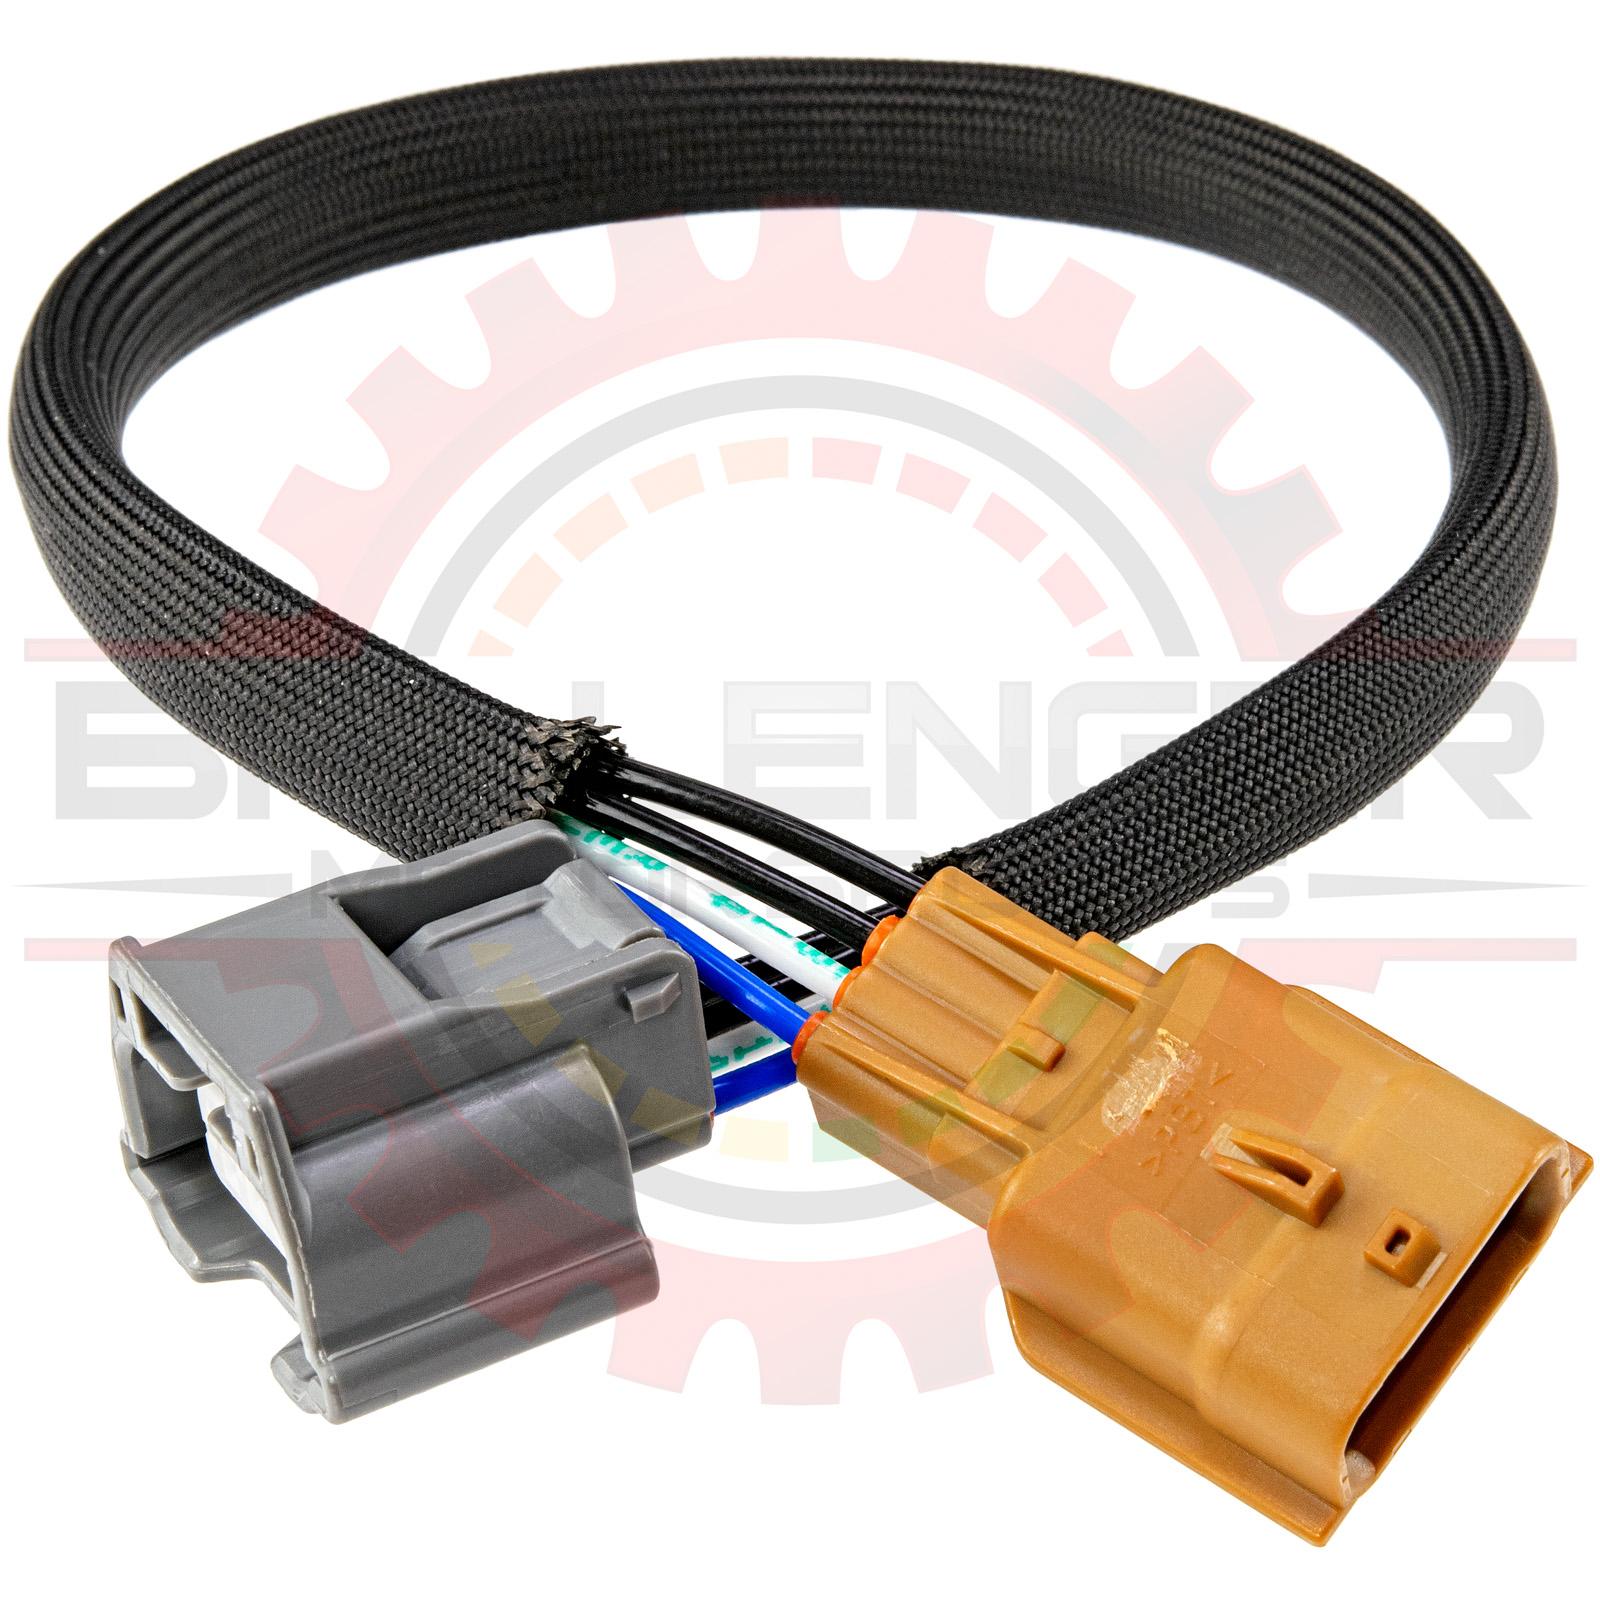 home » shop » connectors / harnesses » yazaki » 4 way low keyway nissan  oxygen sensor connector extension for 370z, titan  ballenger motorsports